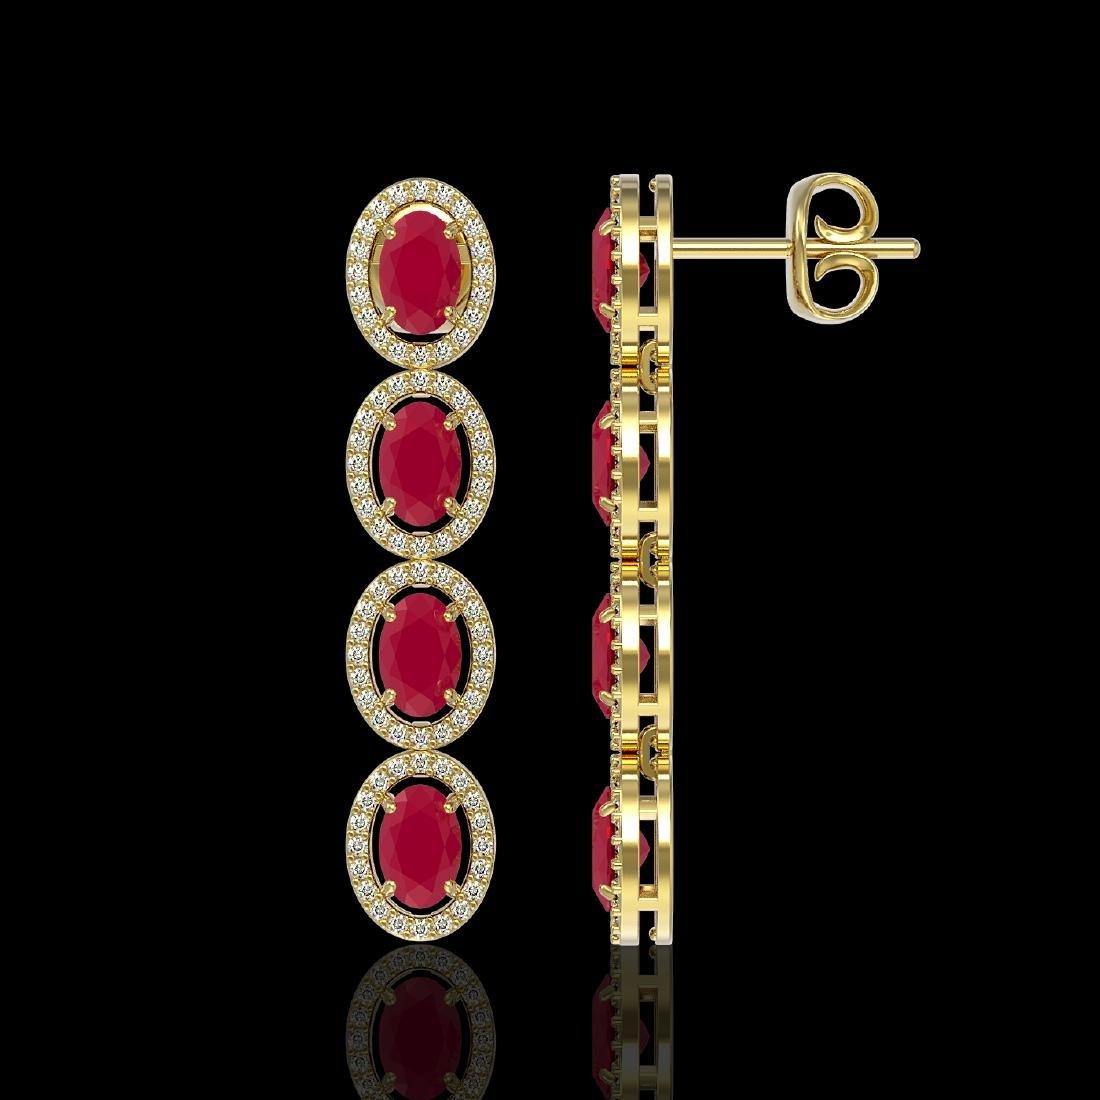 6.47 CTW Ruby & Diamond Halo Earrings 10K Yellow Gold - 2